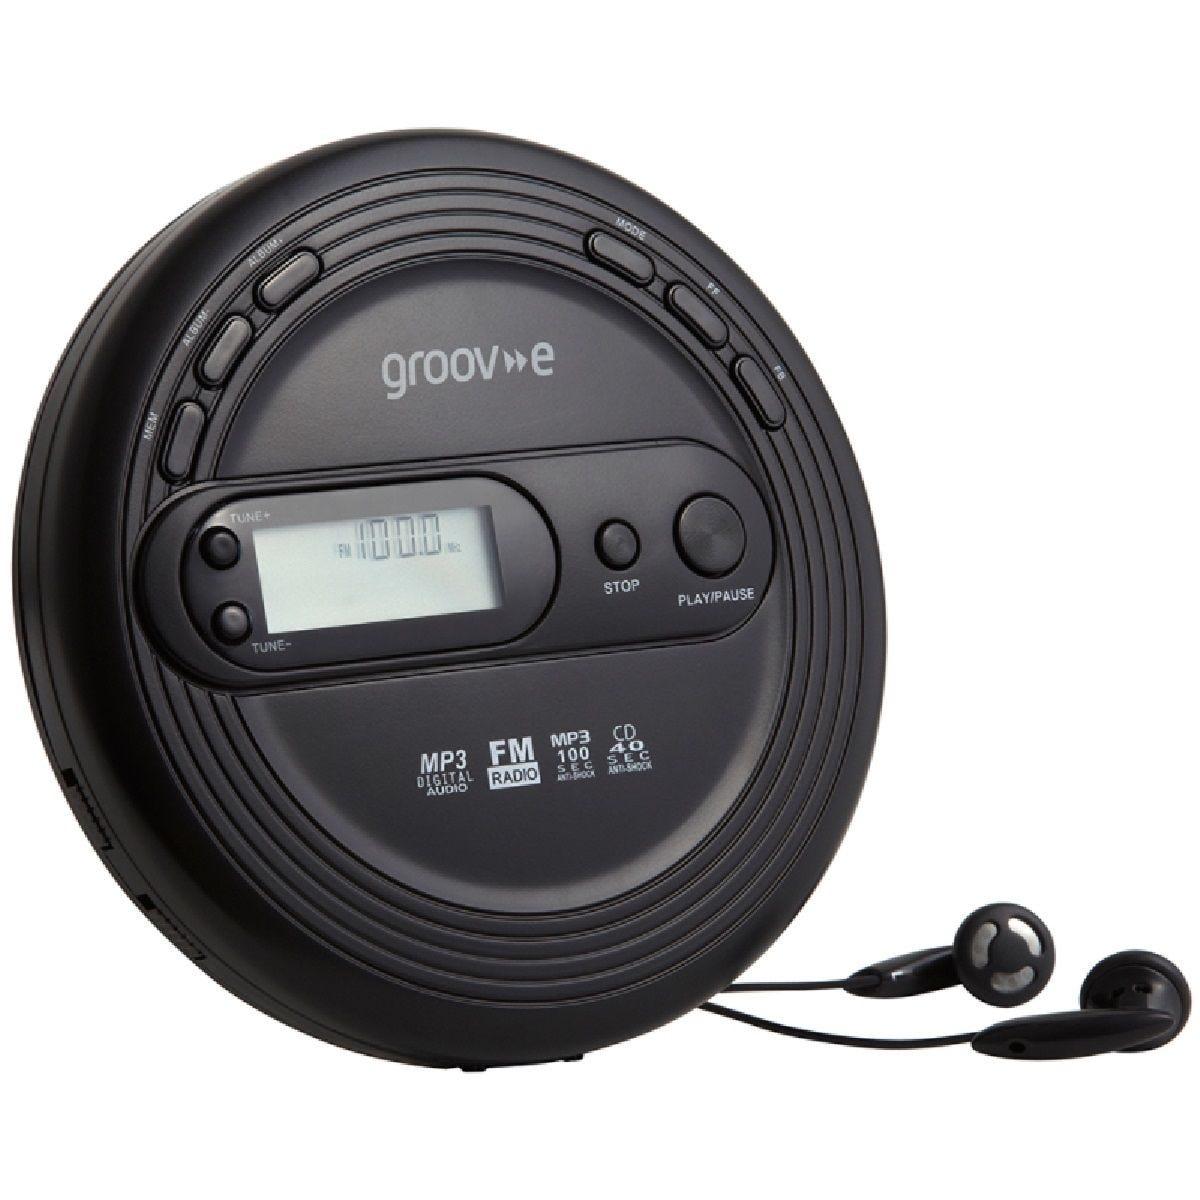 Groov-e Retro Series Personal CD Player with FM Radio - Black